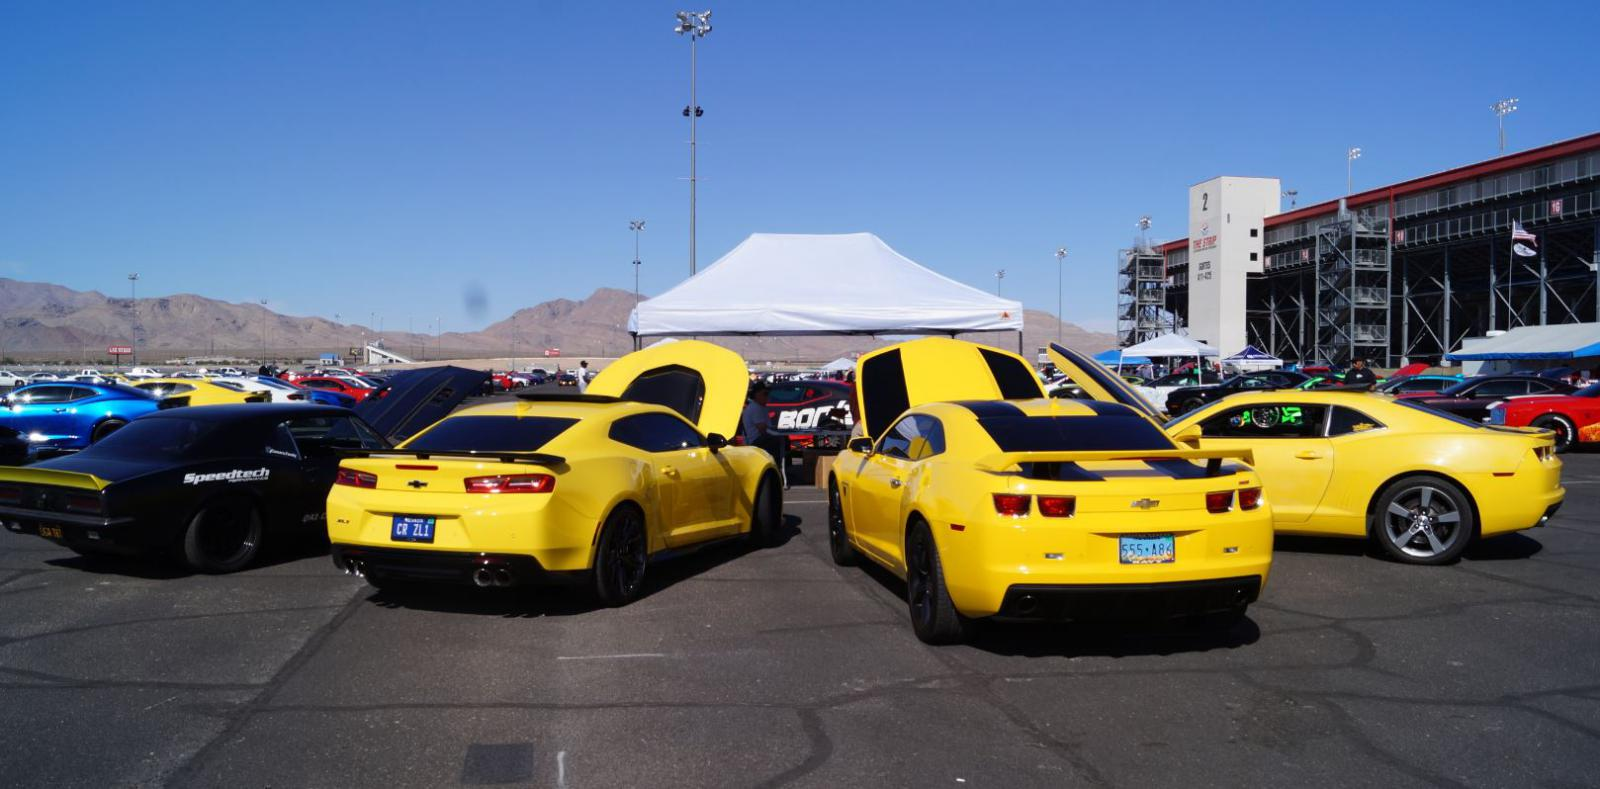 Name:  parking lot yellow cars.jpg Views: 187 Size:  132.5 KB